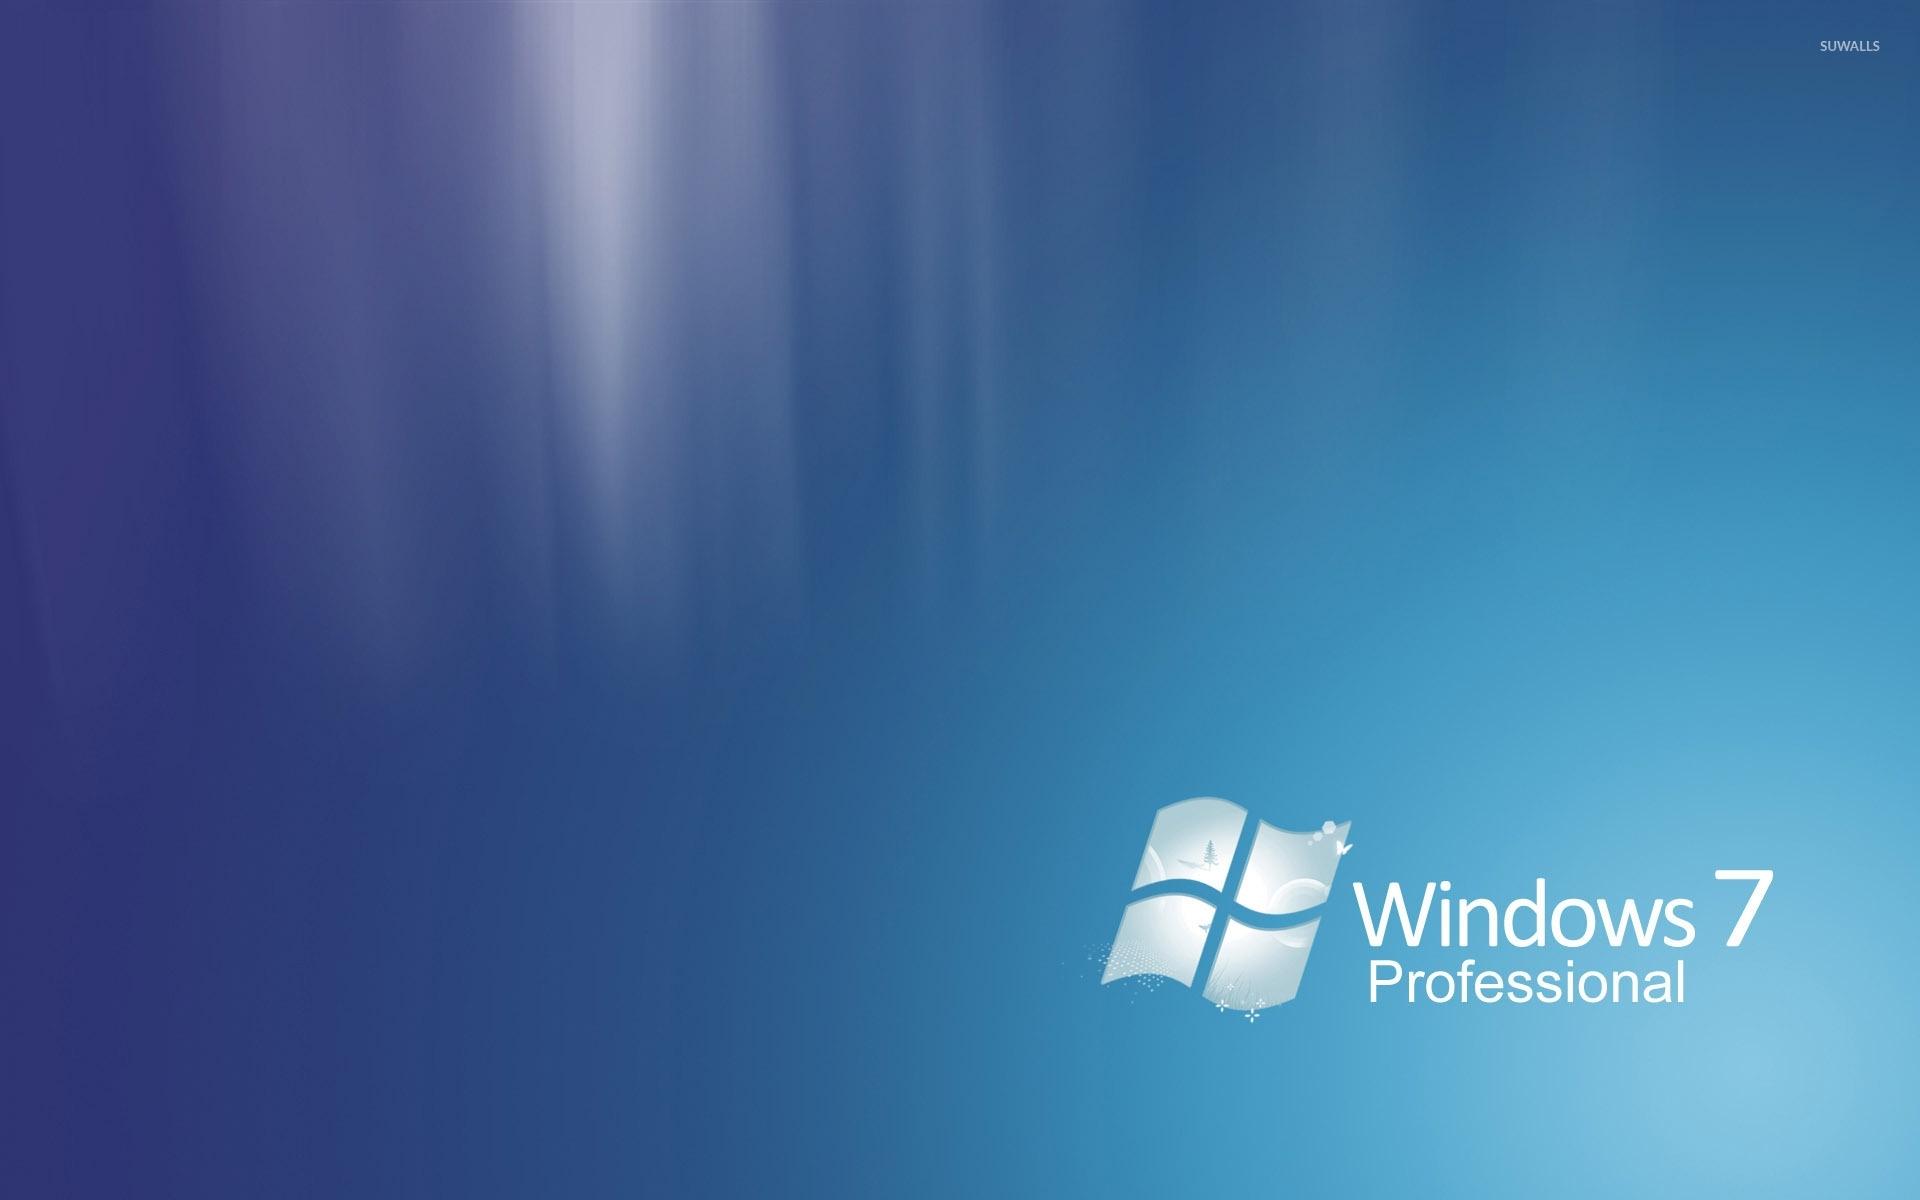 windows 7 professional [2] wallpaper - computer wallpapers - #34734